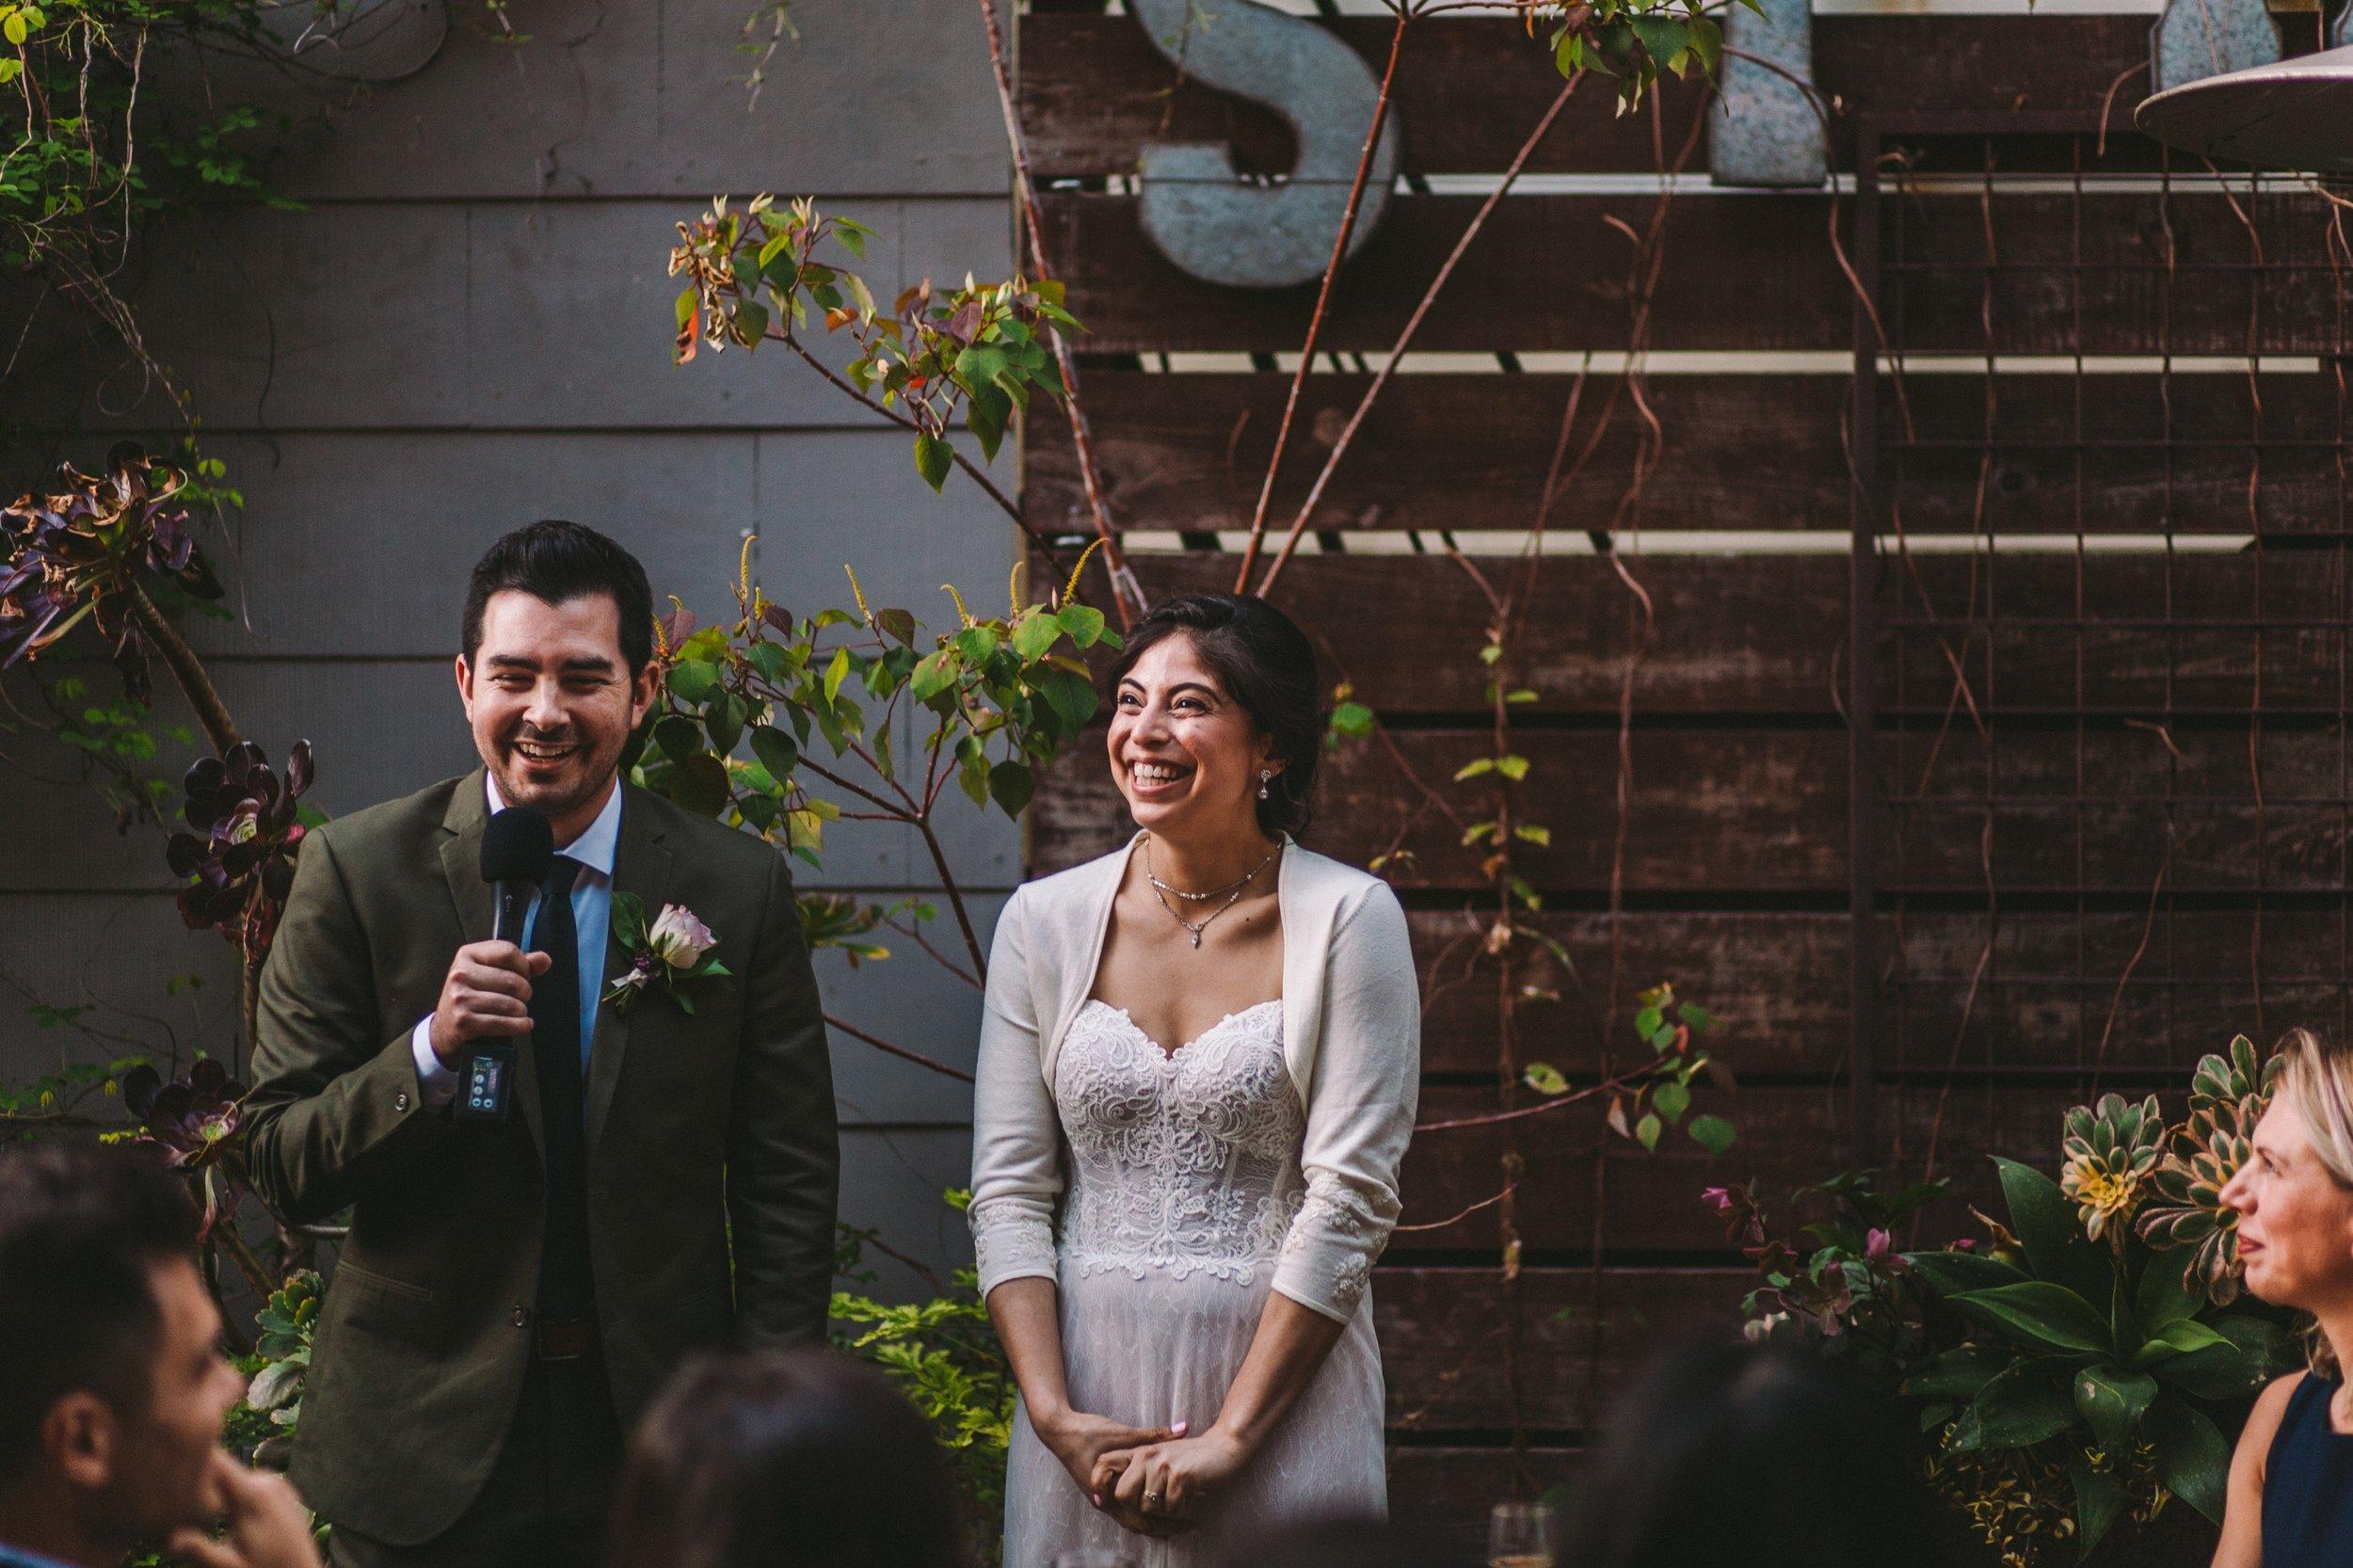 San Francisco City Hall & Stable Cafe Wedding Photography 558.jpg